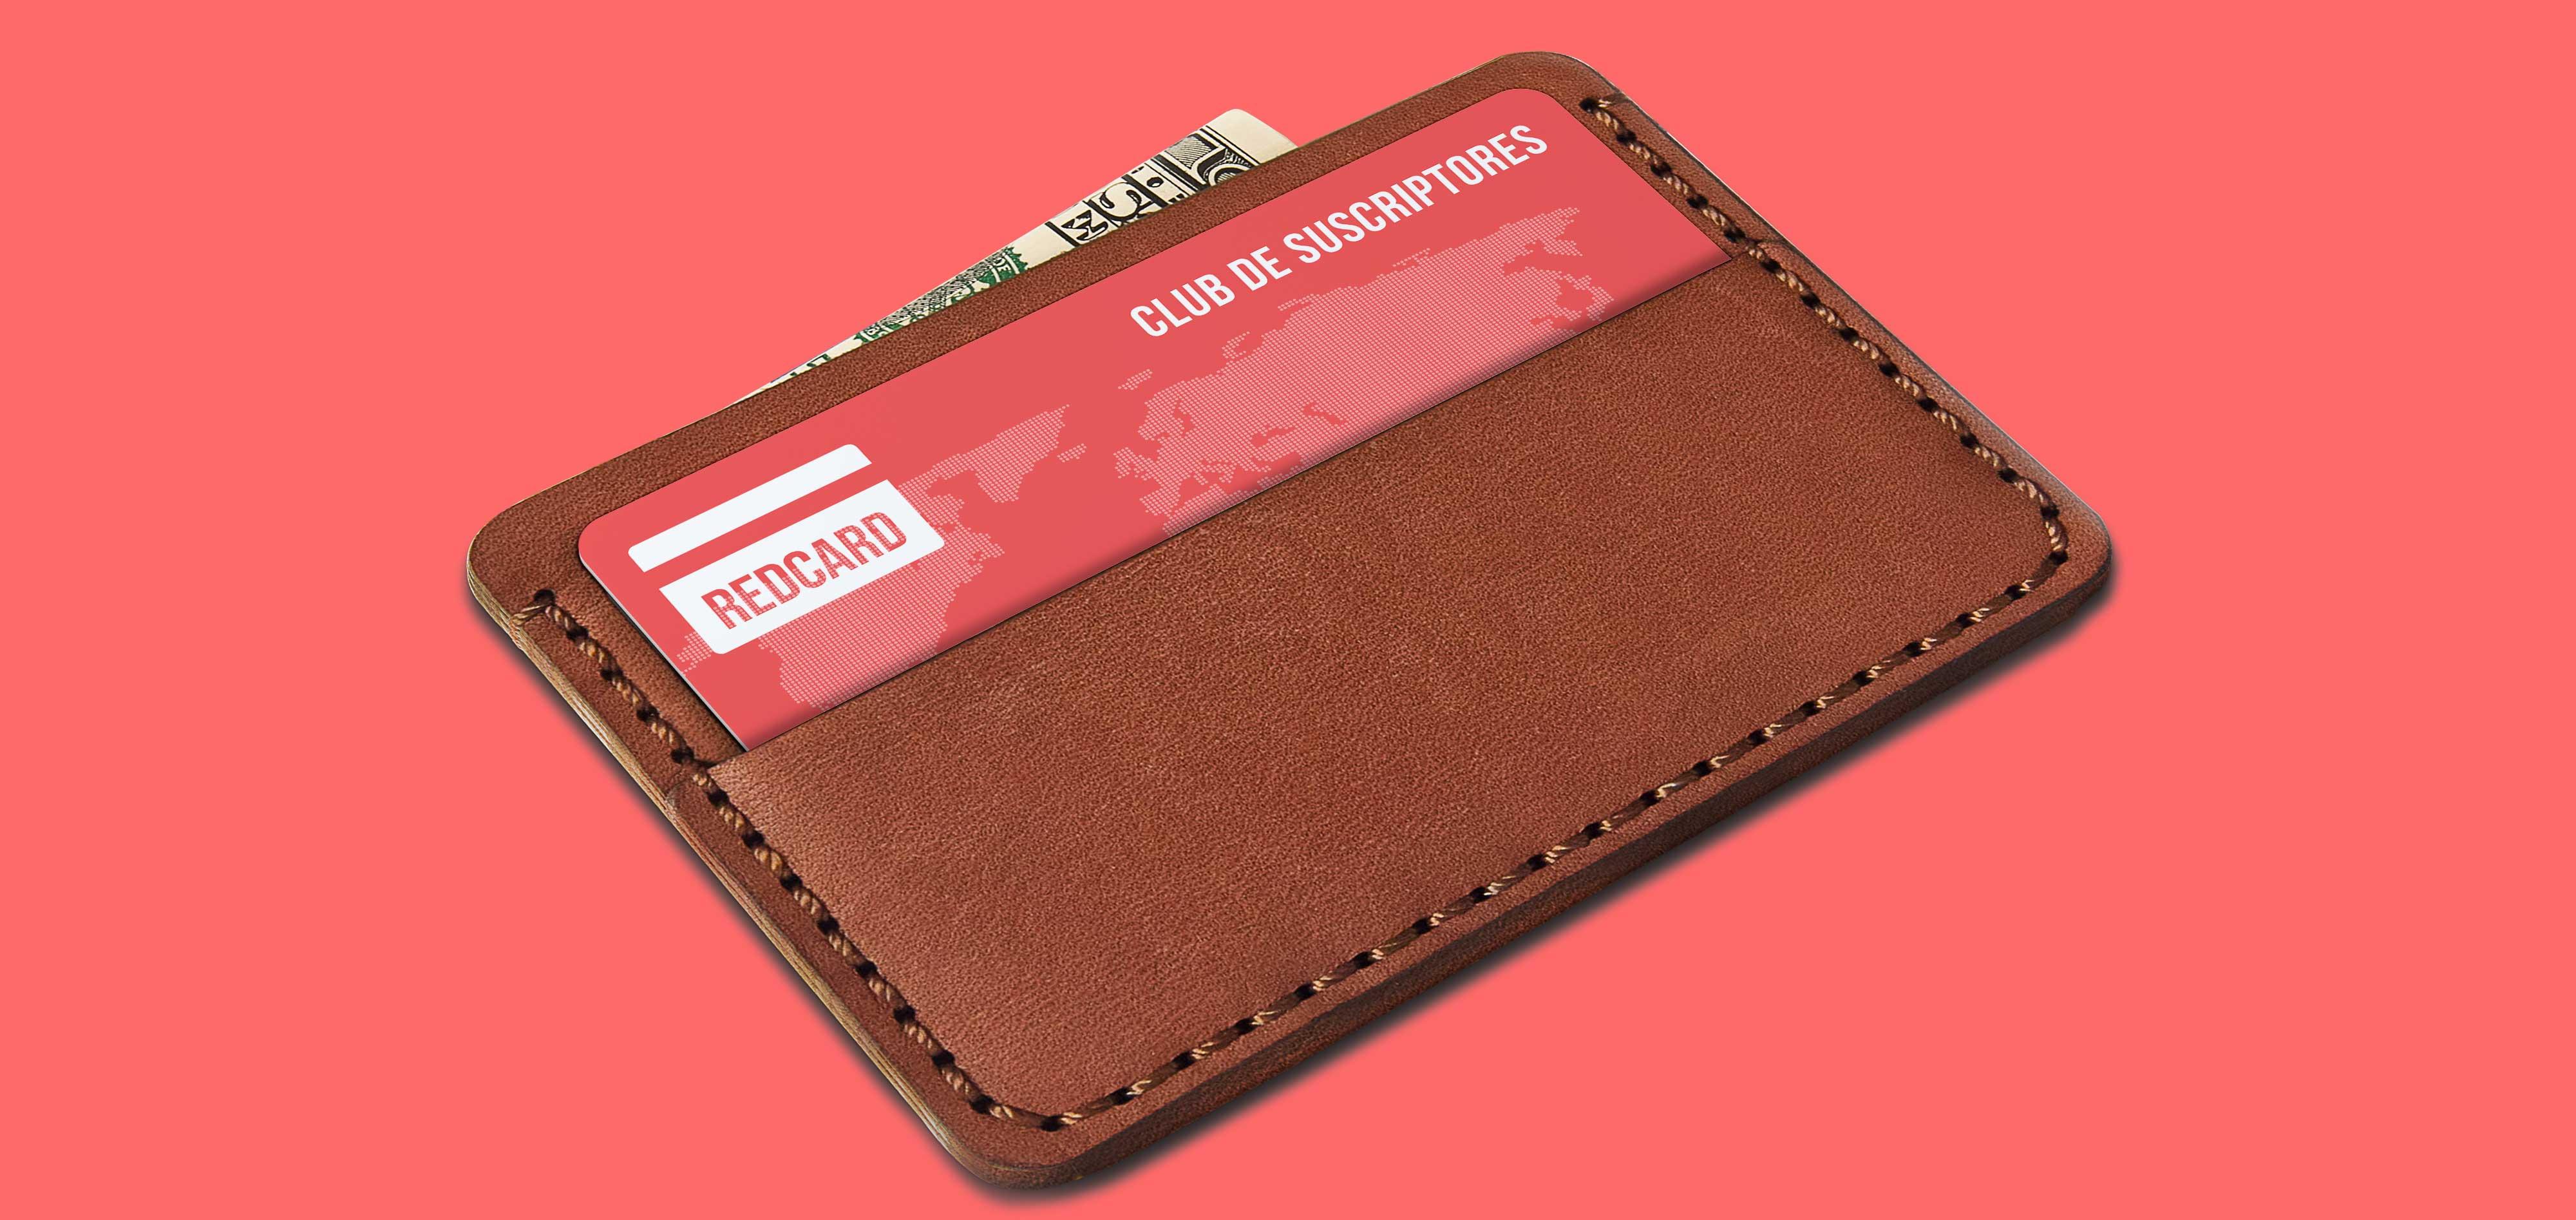 Billetera Redcard